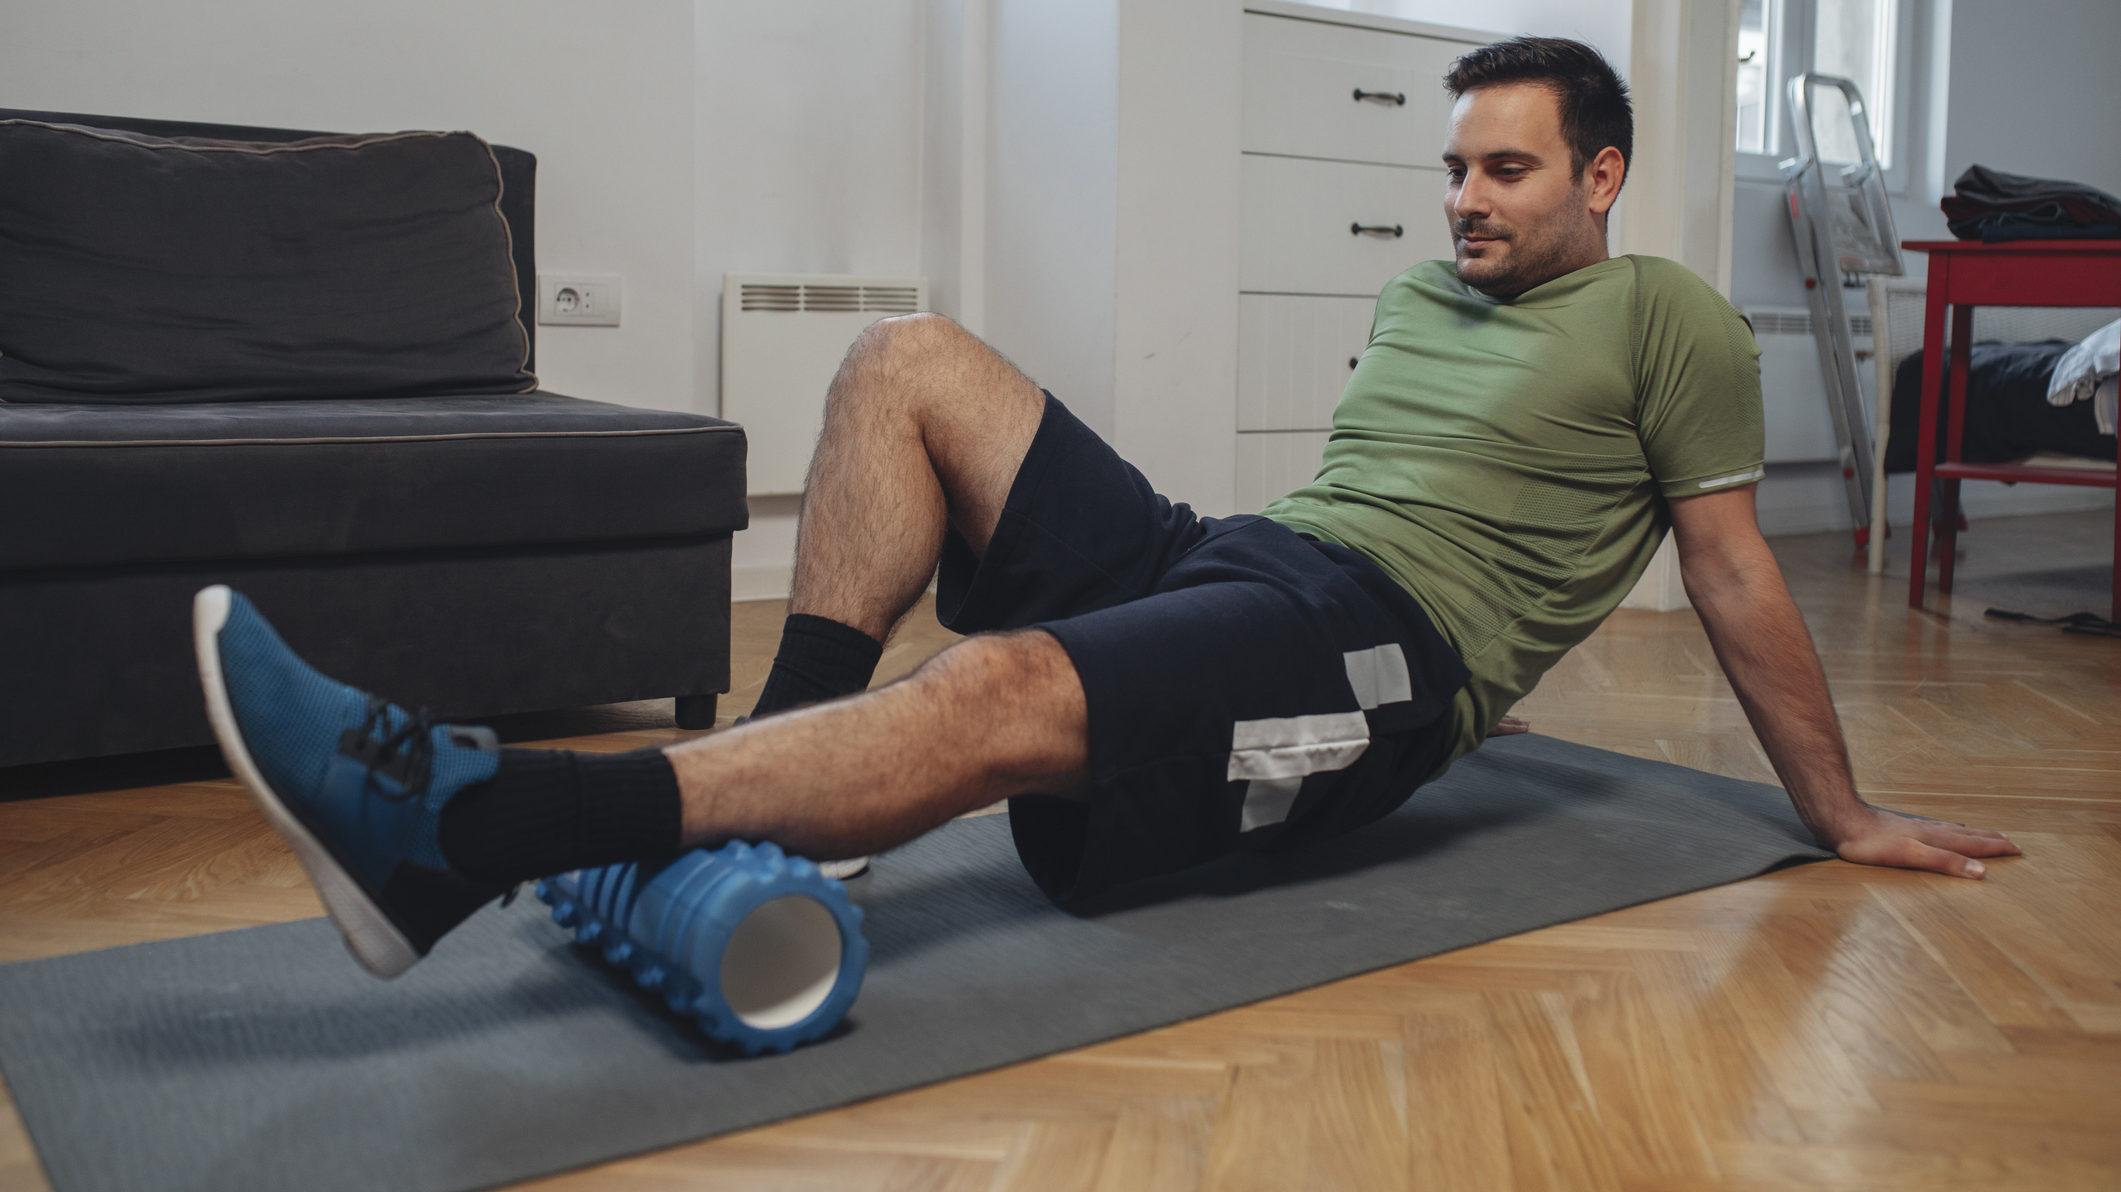 Man using foam roller to address musculoskeletal pain